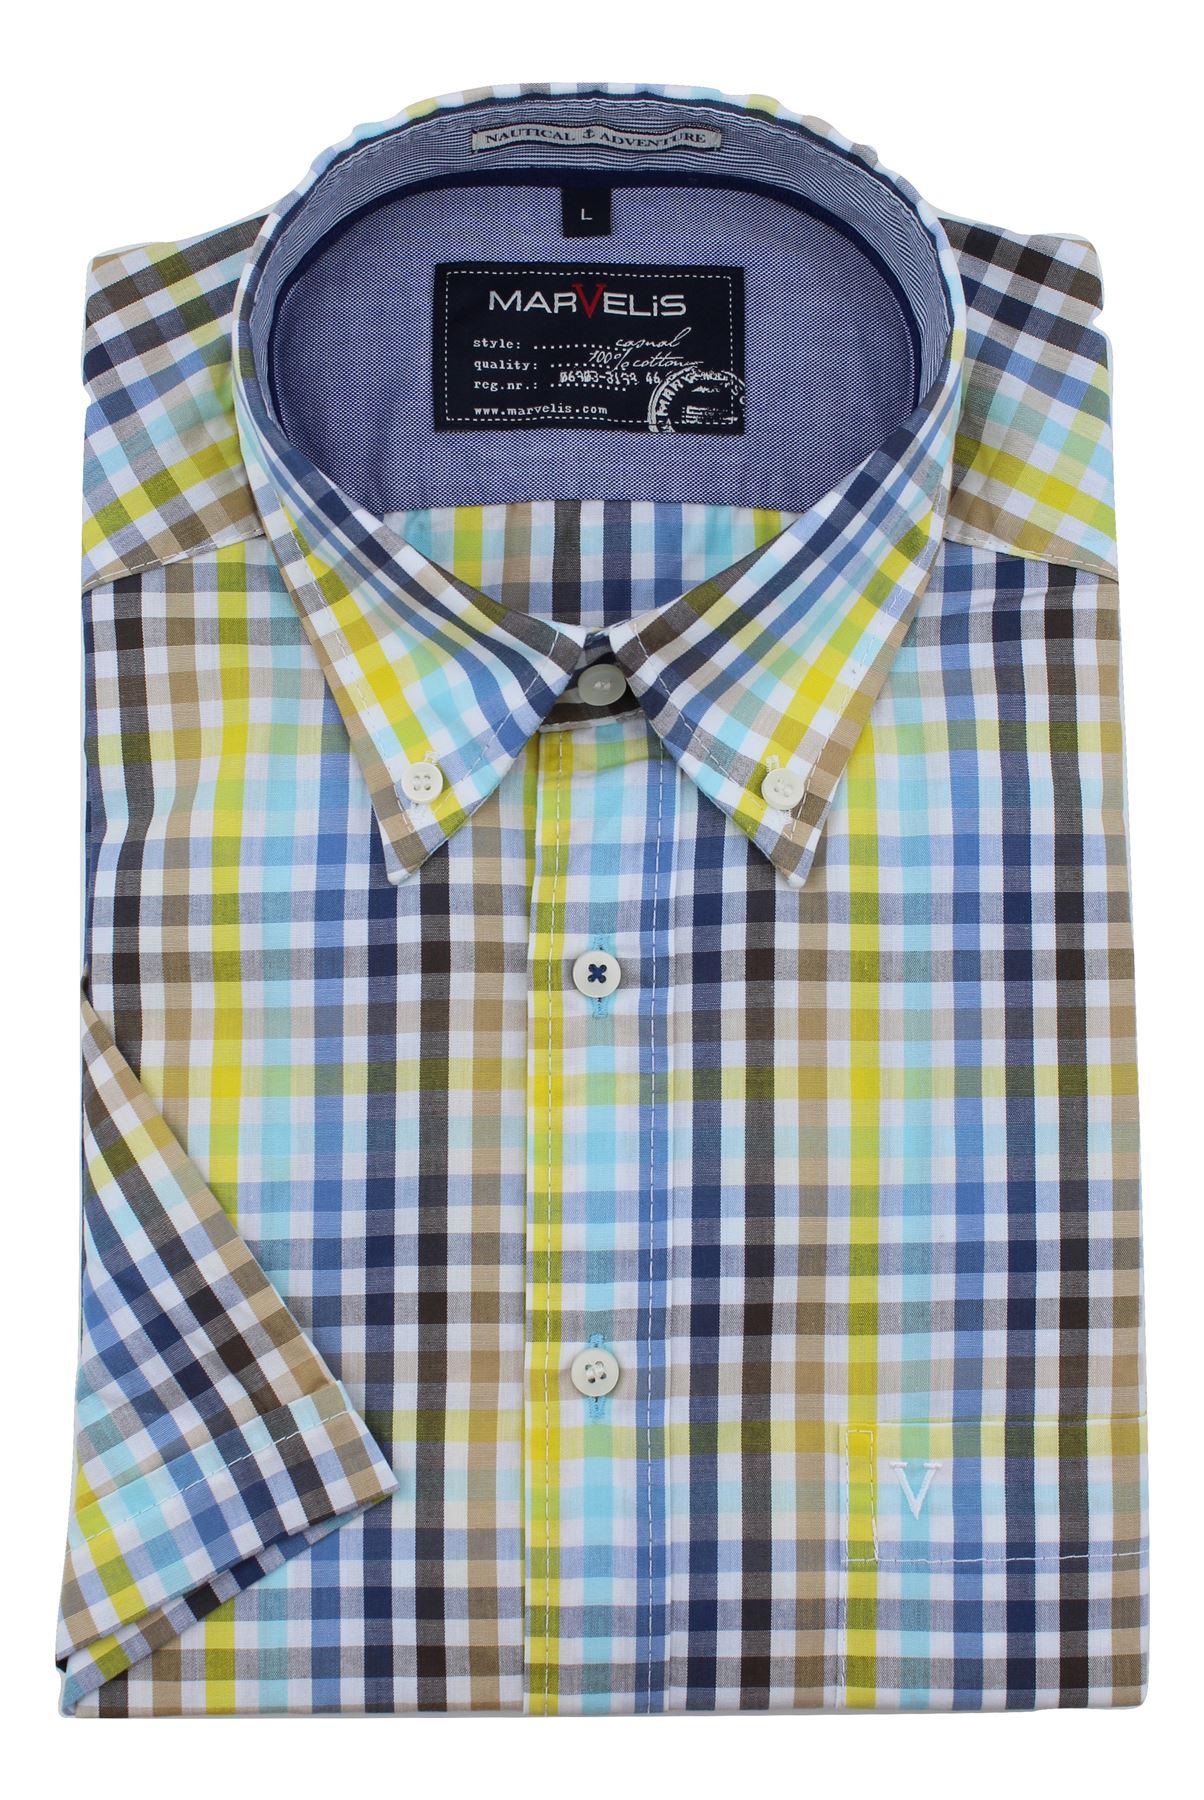 Camisa-Hombre-Marvelis-Corte-Moderno-Algodon-Puro-Easycare-Casual-Manga-Corta